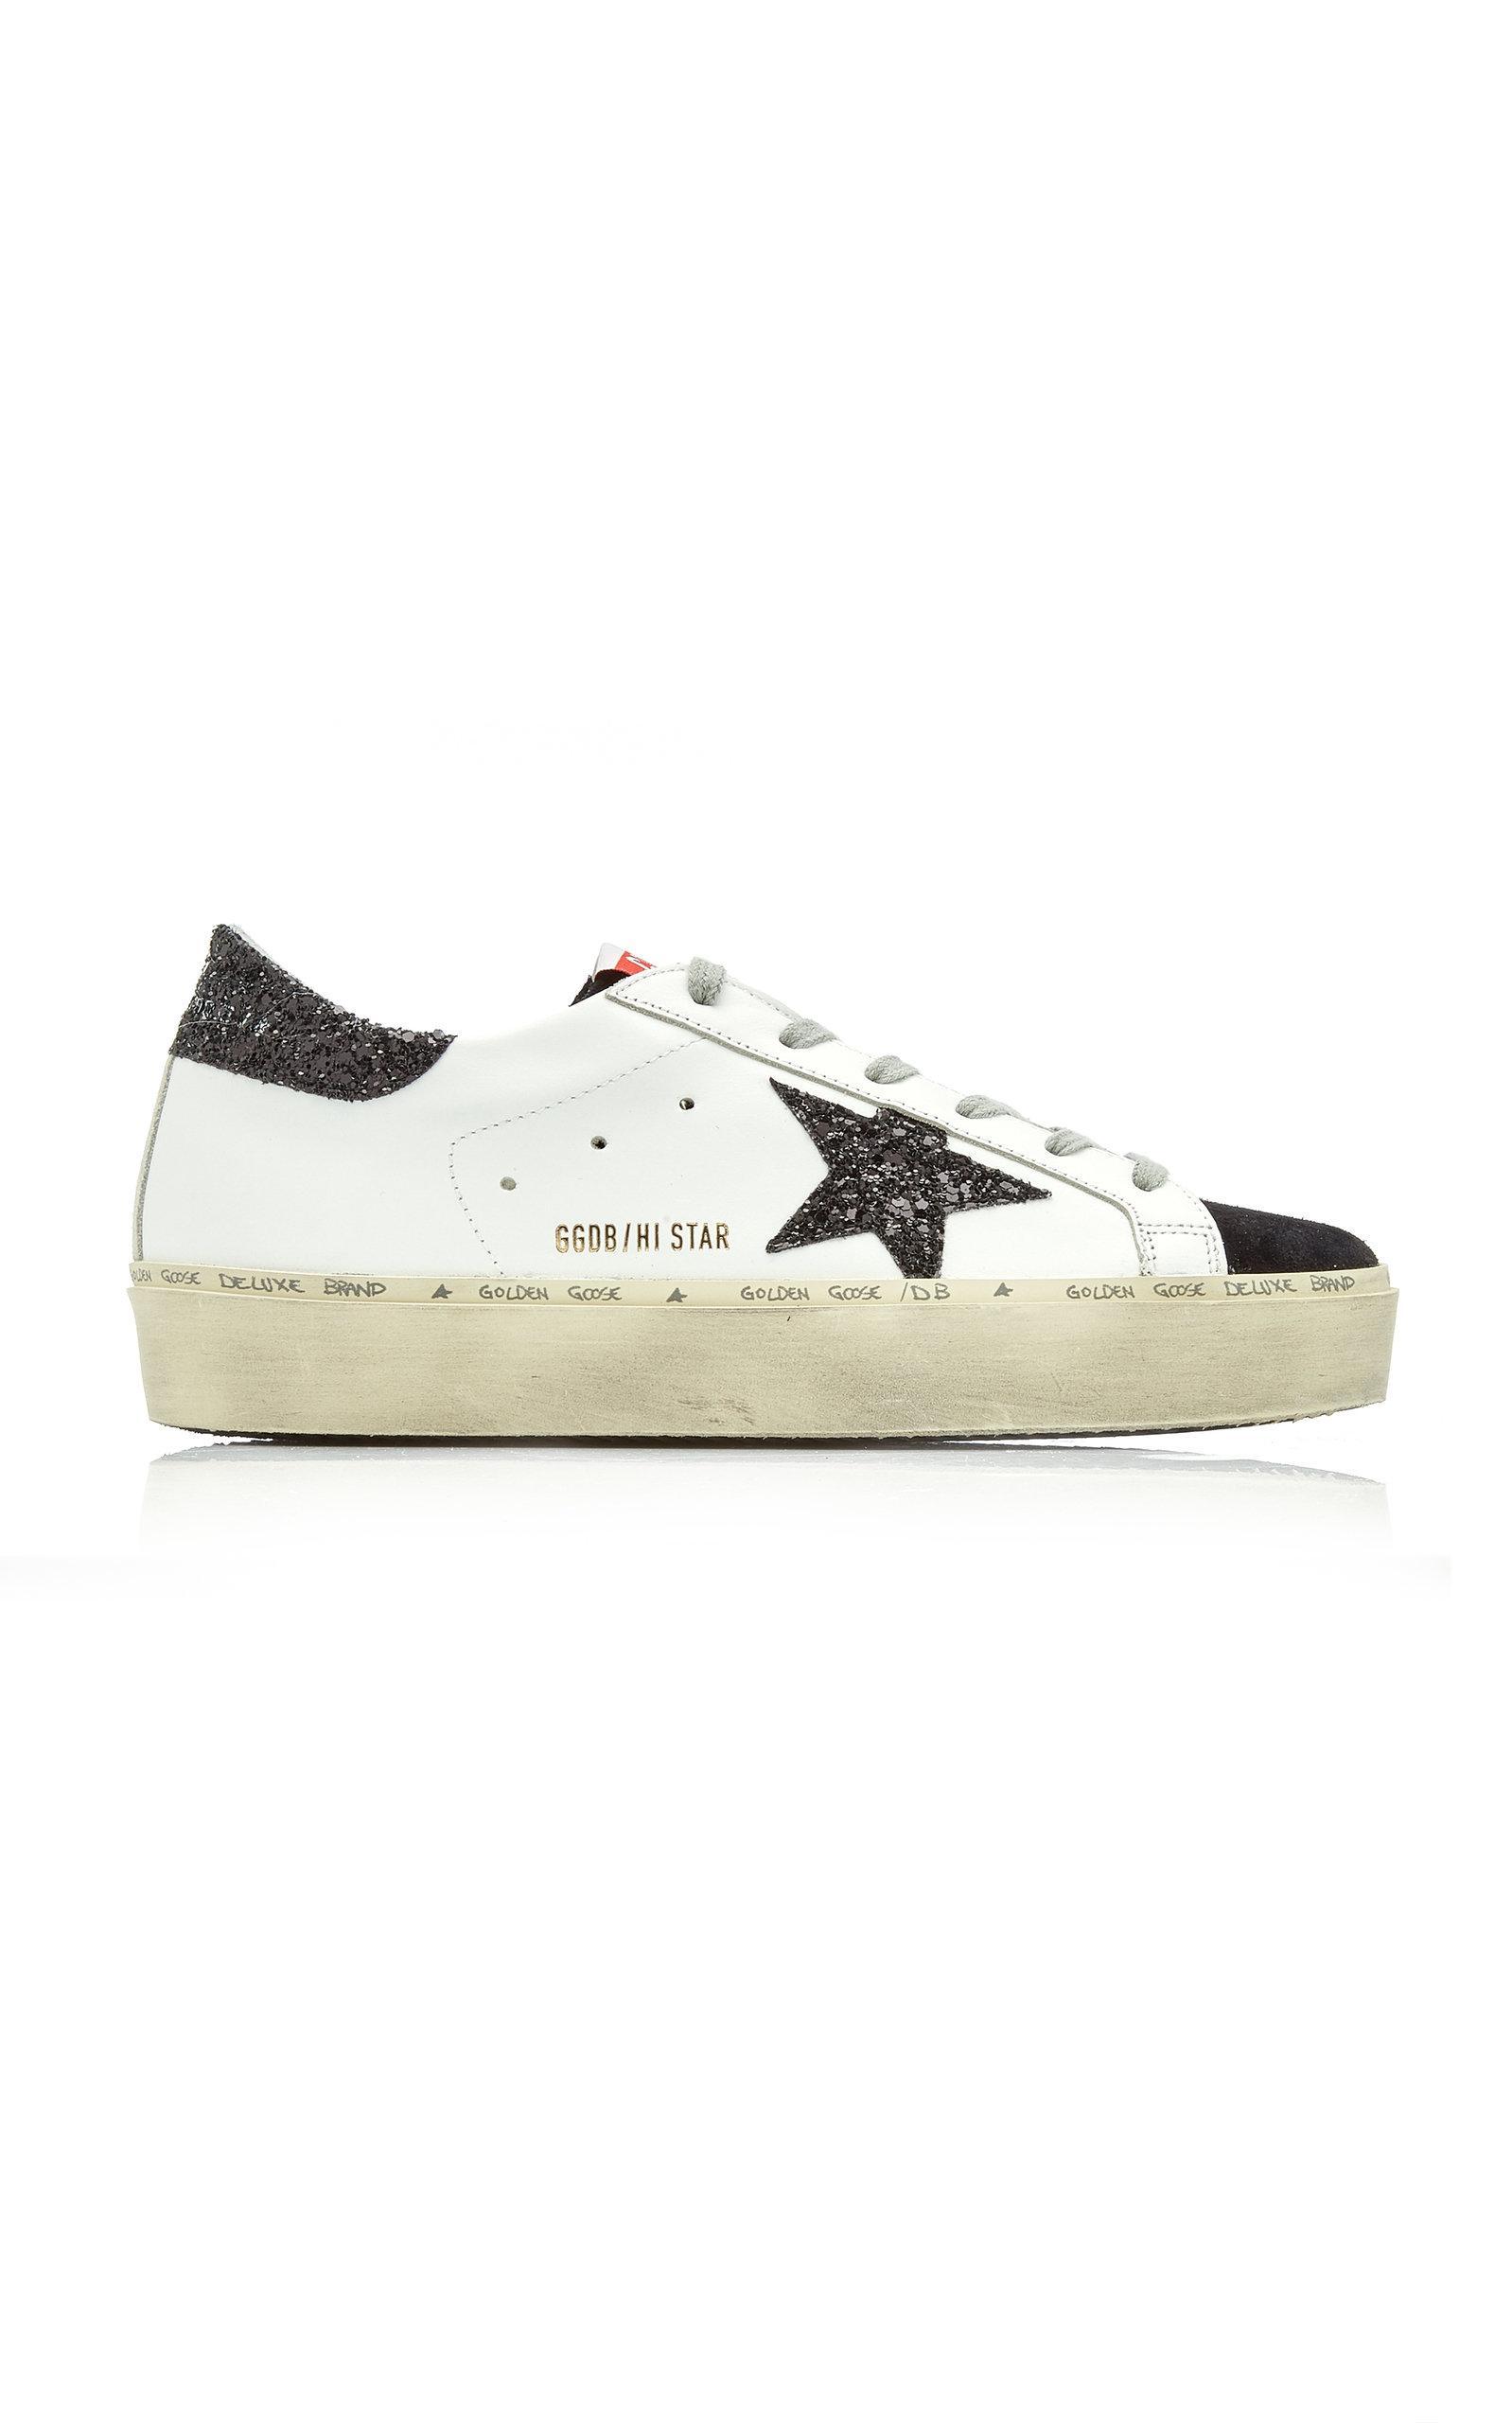 Golden Goose - Women's Hi-Star Leather Sneakers - Black/white - Moda Operandi